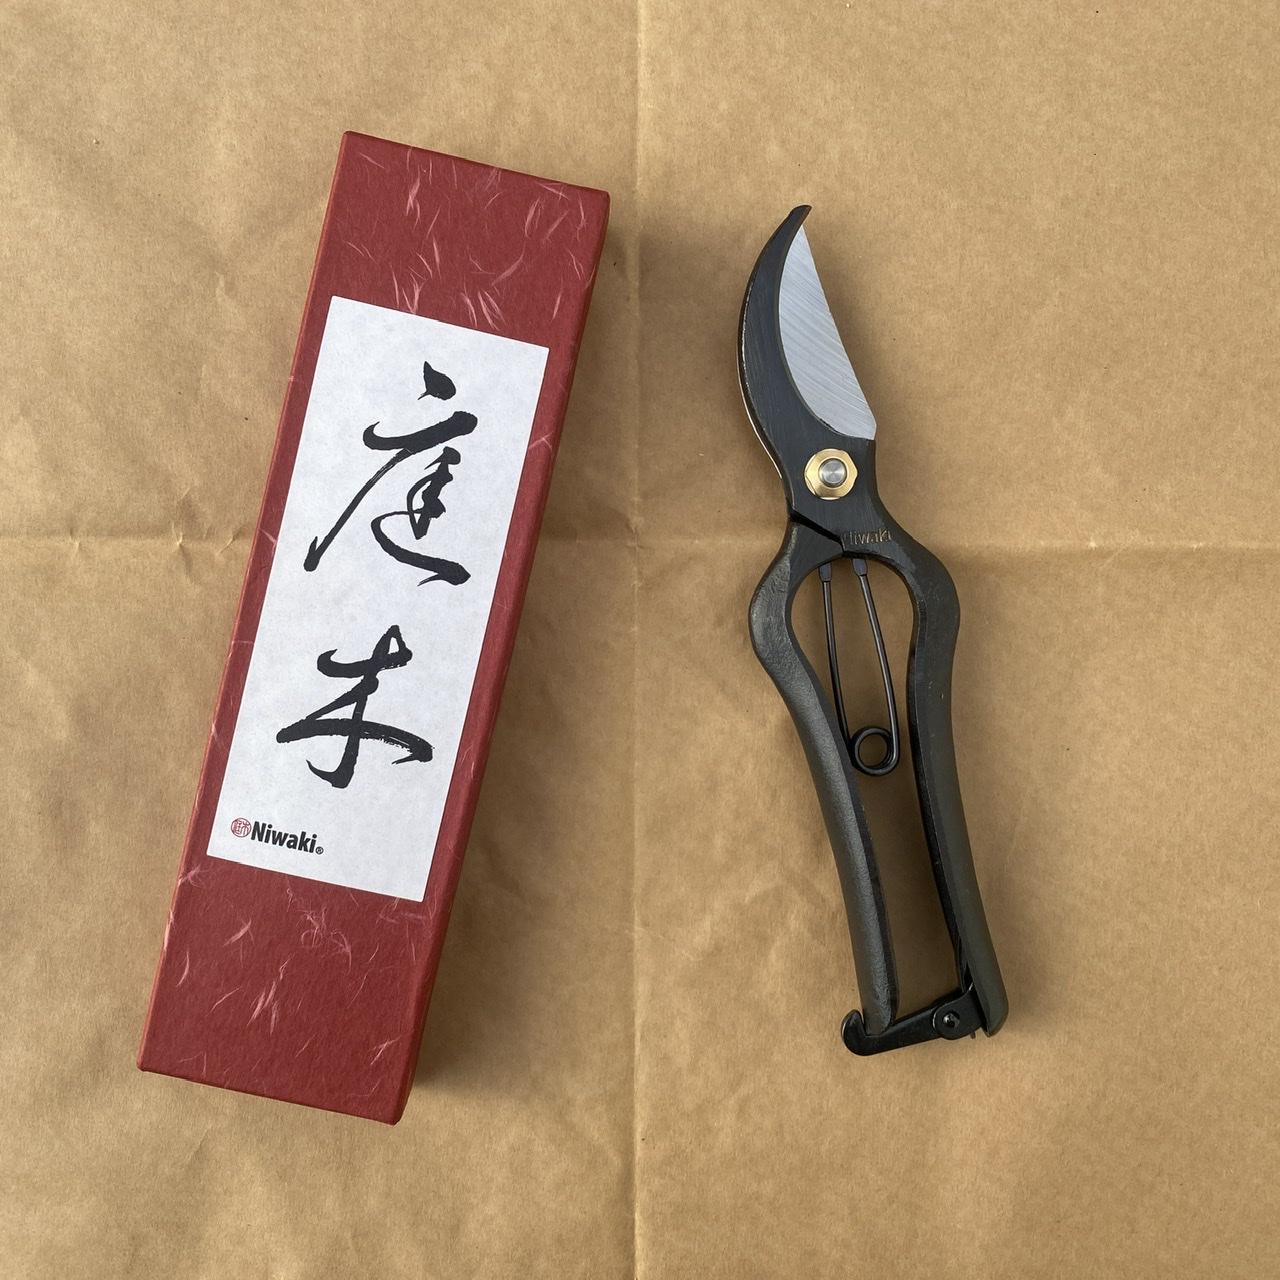 Niwaki Sentei Secateurs